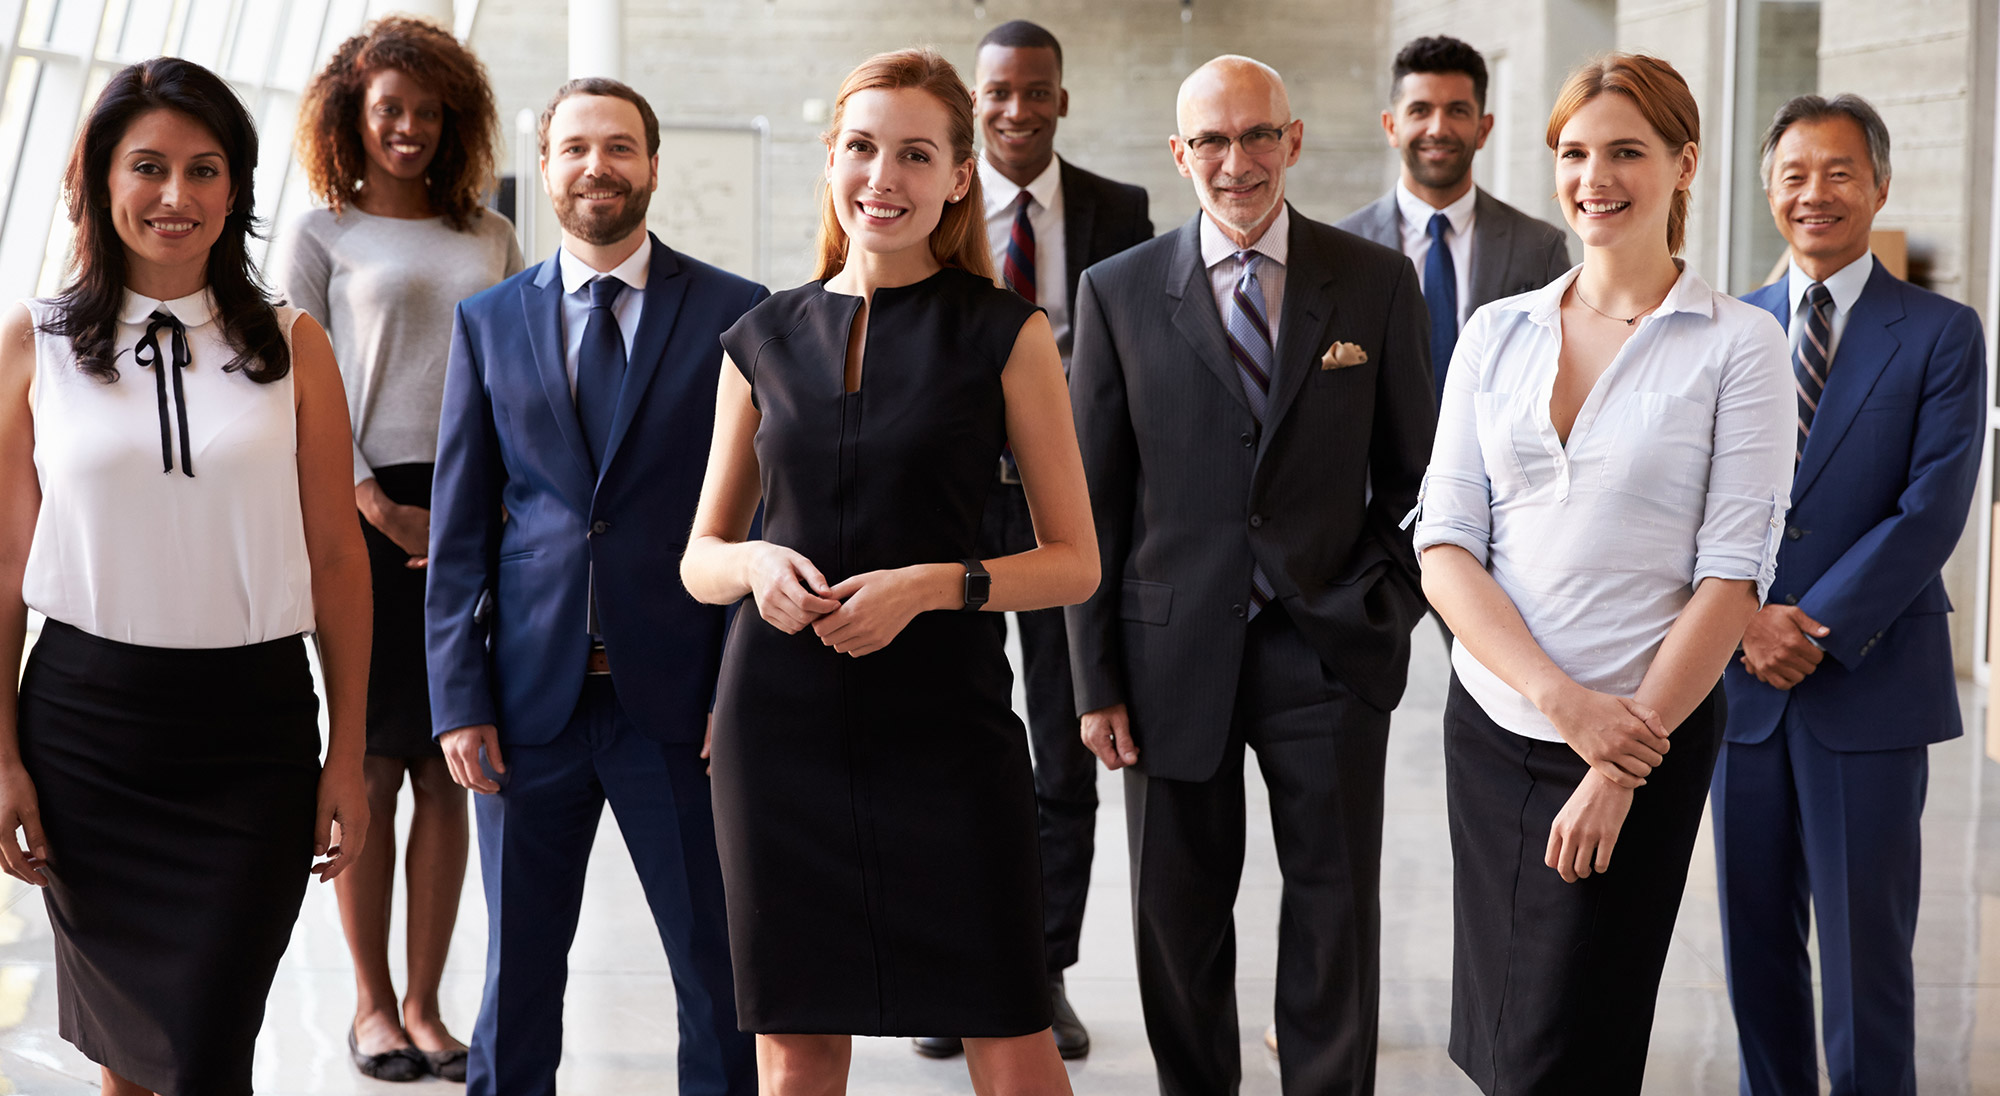 Notre expertise en recrutement - Talenance executive search